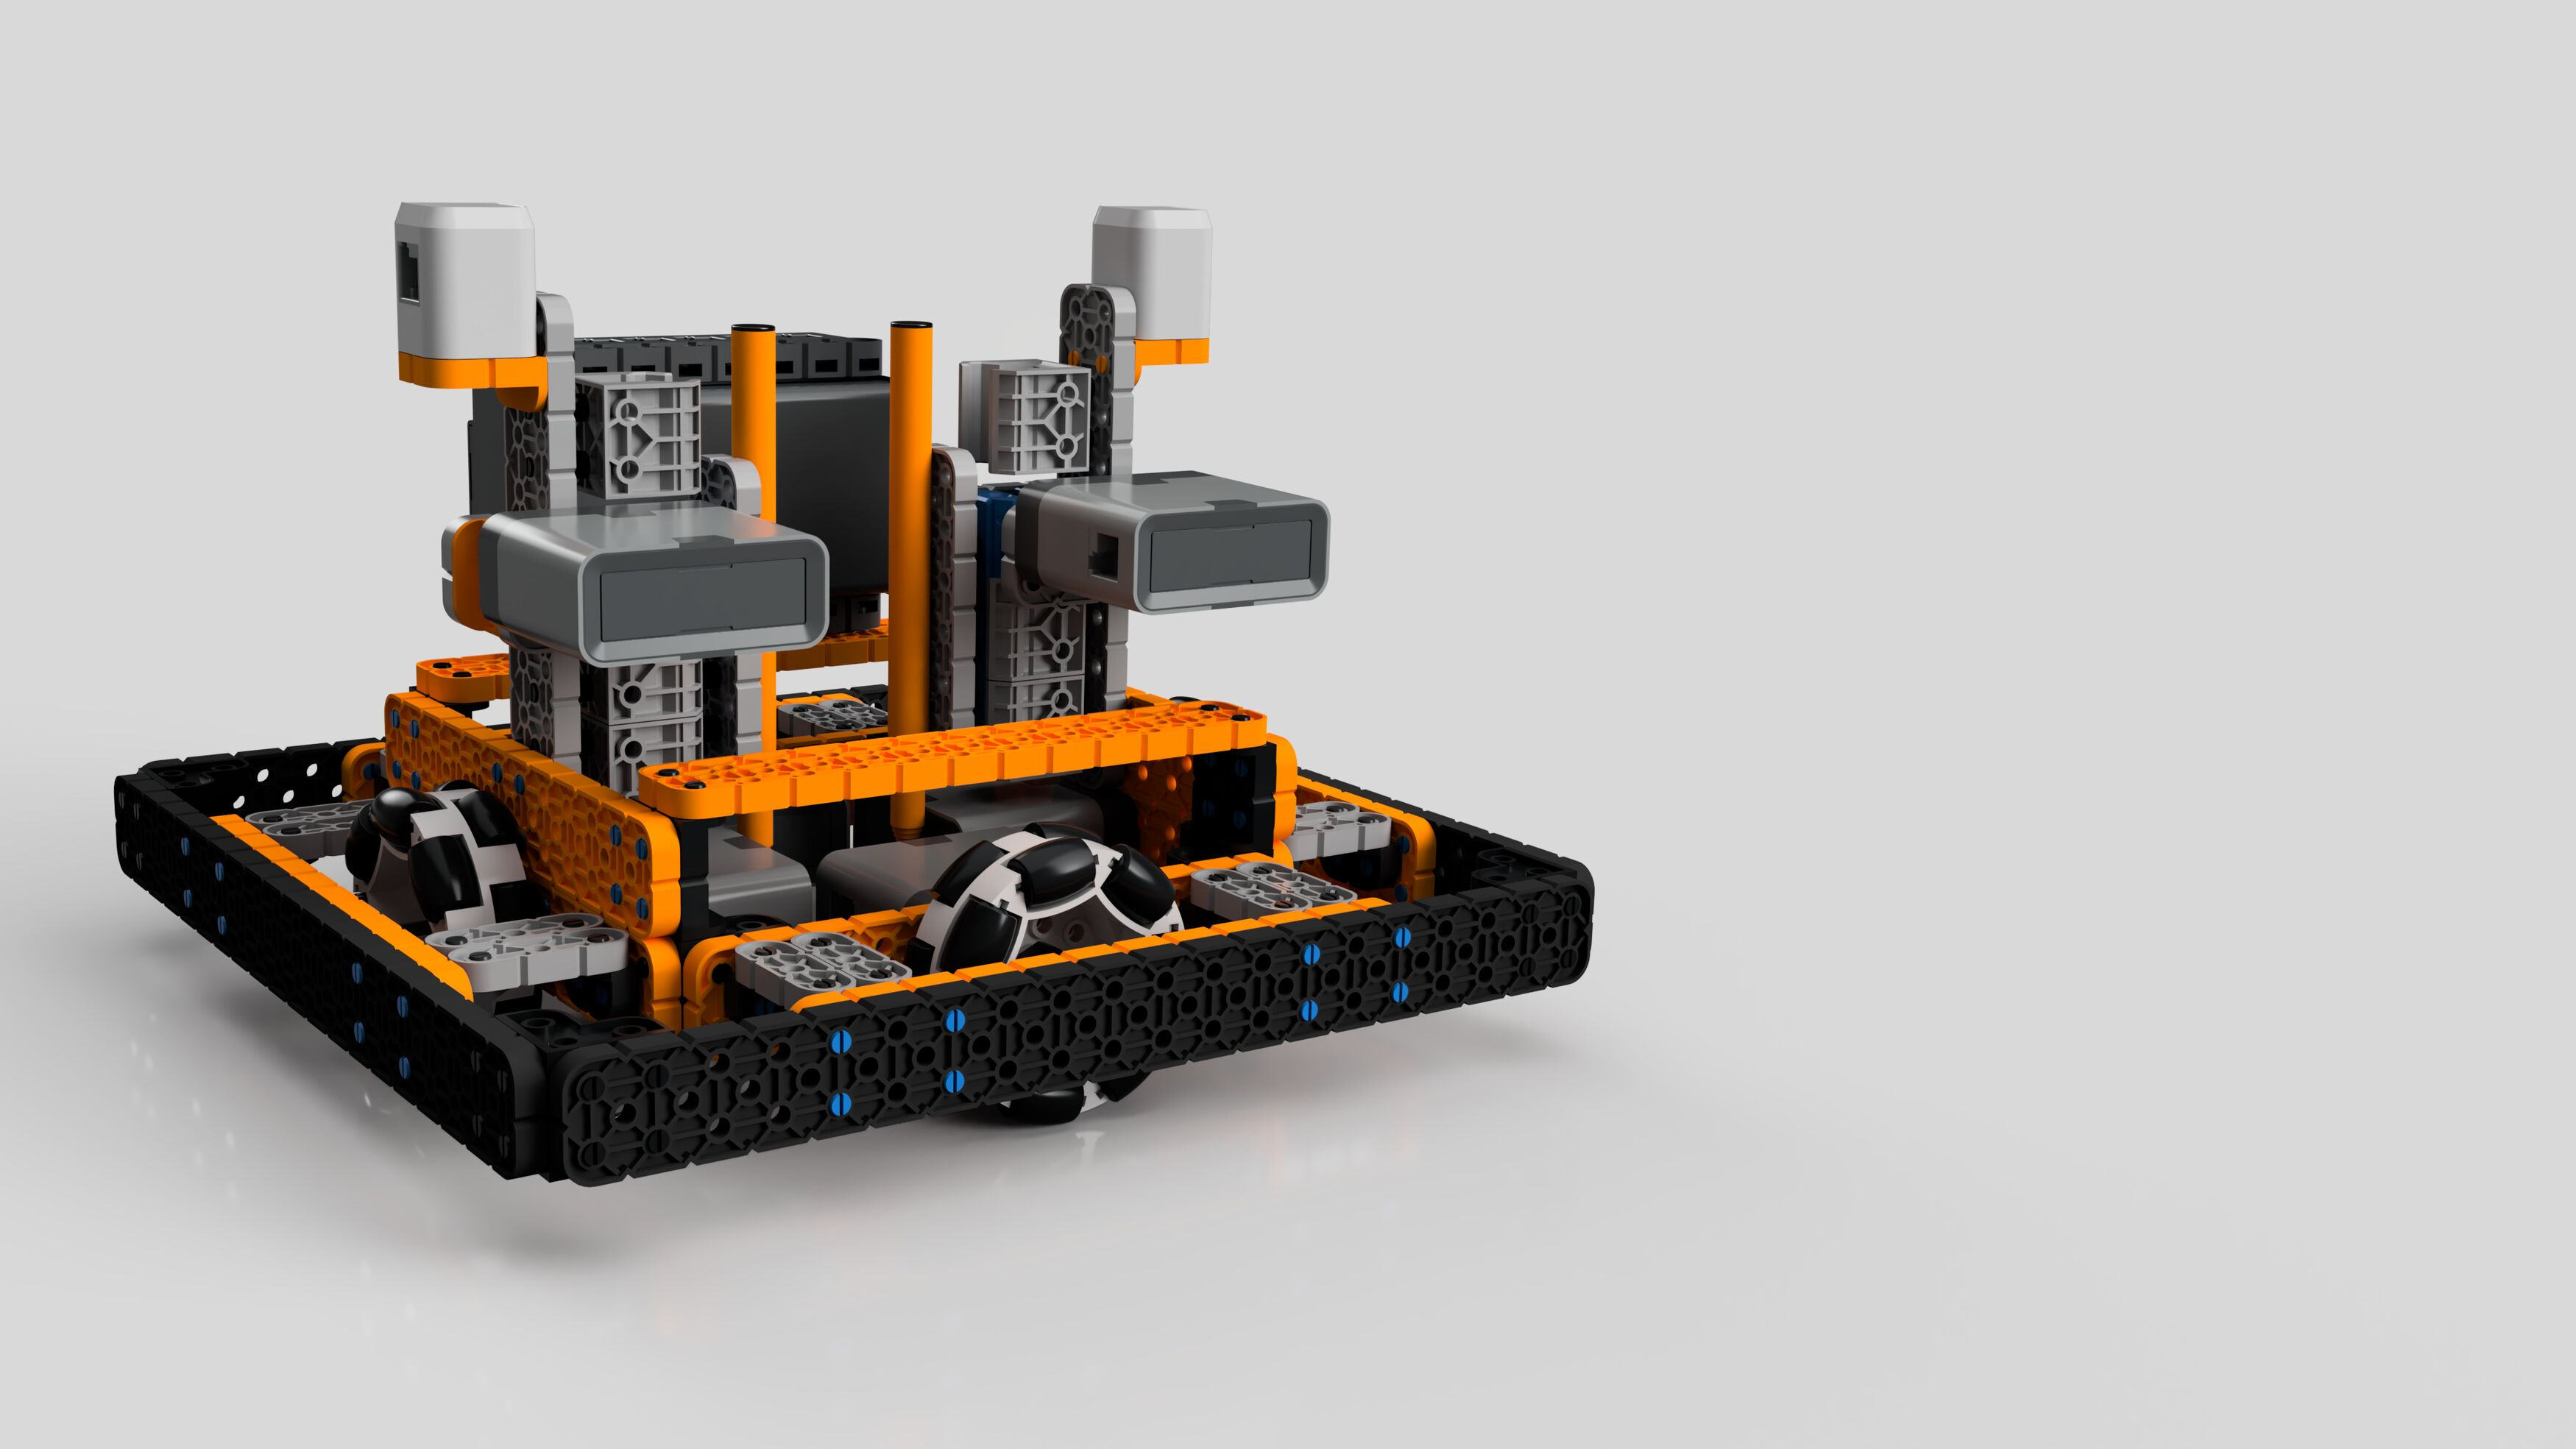 Robotics-pen-oficial-2-cores---fabrica-de-nerdes-2020-may-28-08-06-36pm-000-customizedview2798106725-png-3500-3500